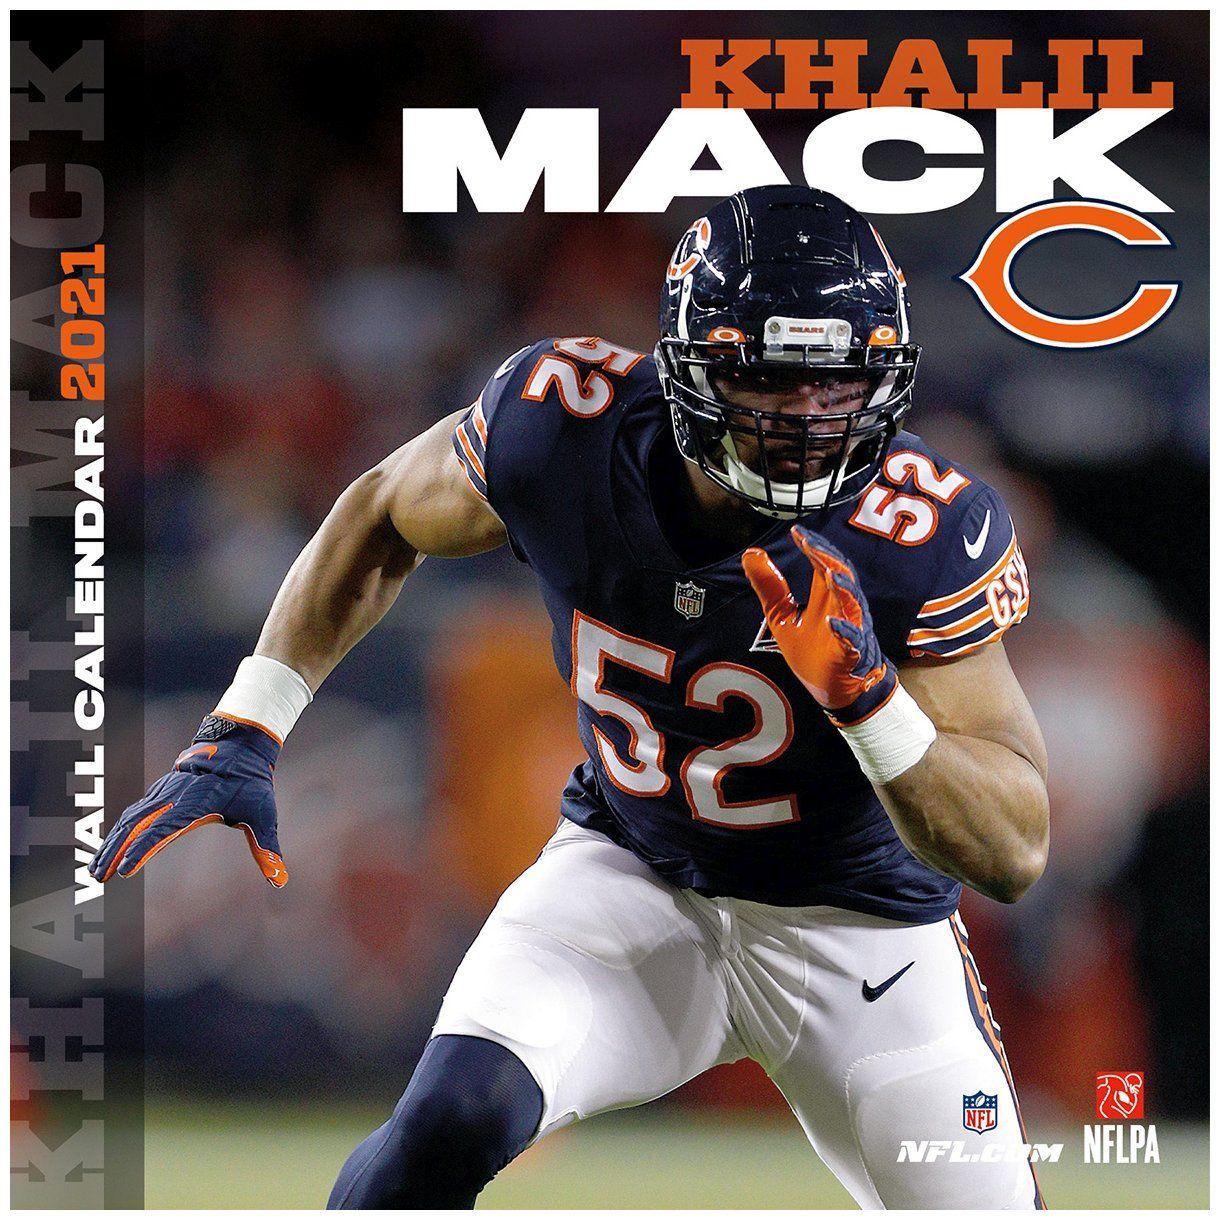 amfoo - NFL 30x30 Wand-Kalender 2021 Chicago Bears Khalil Mack